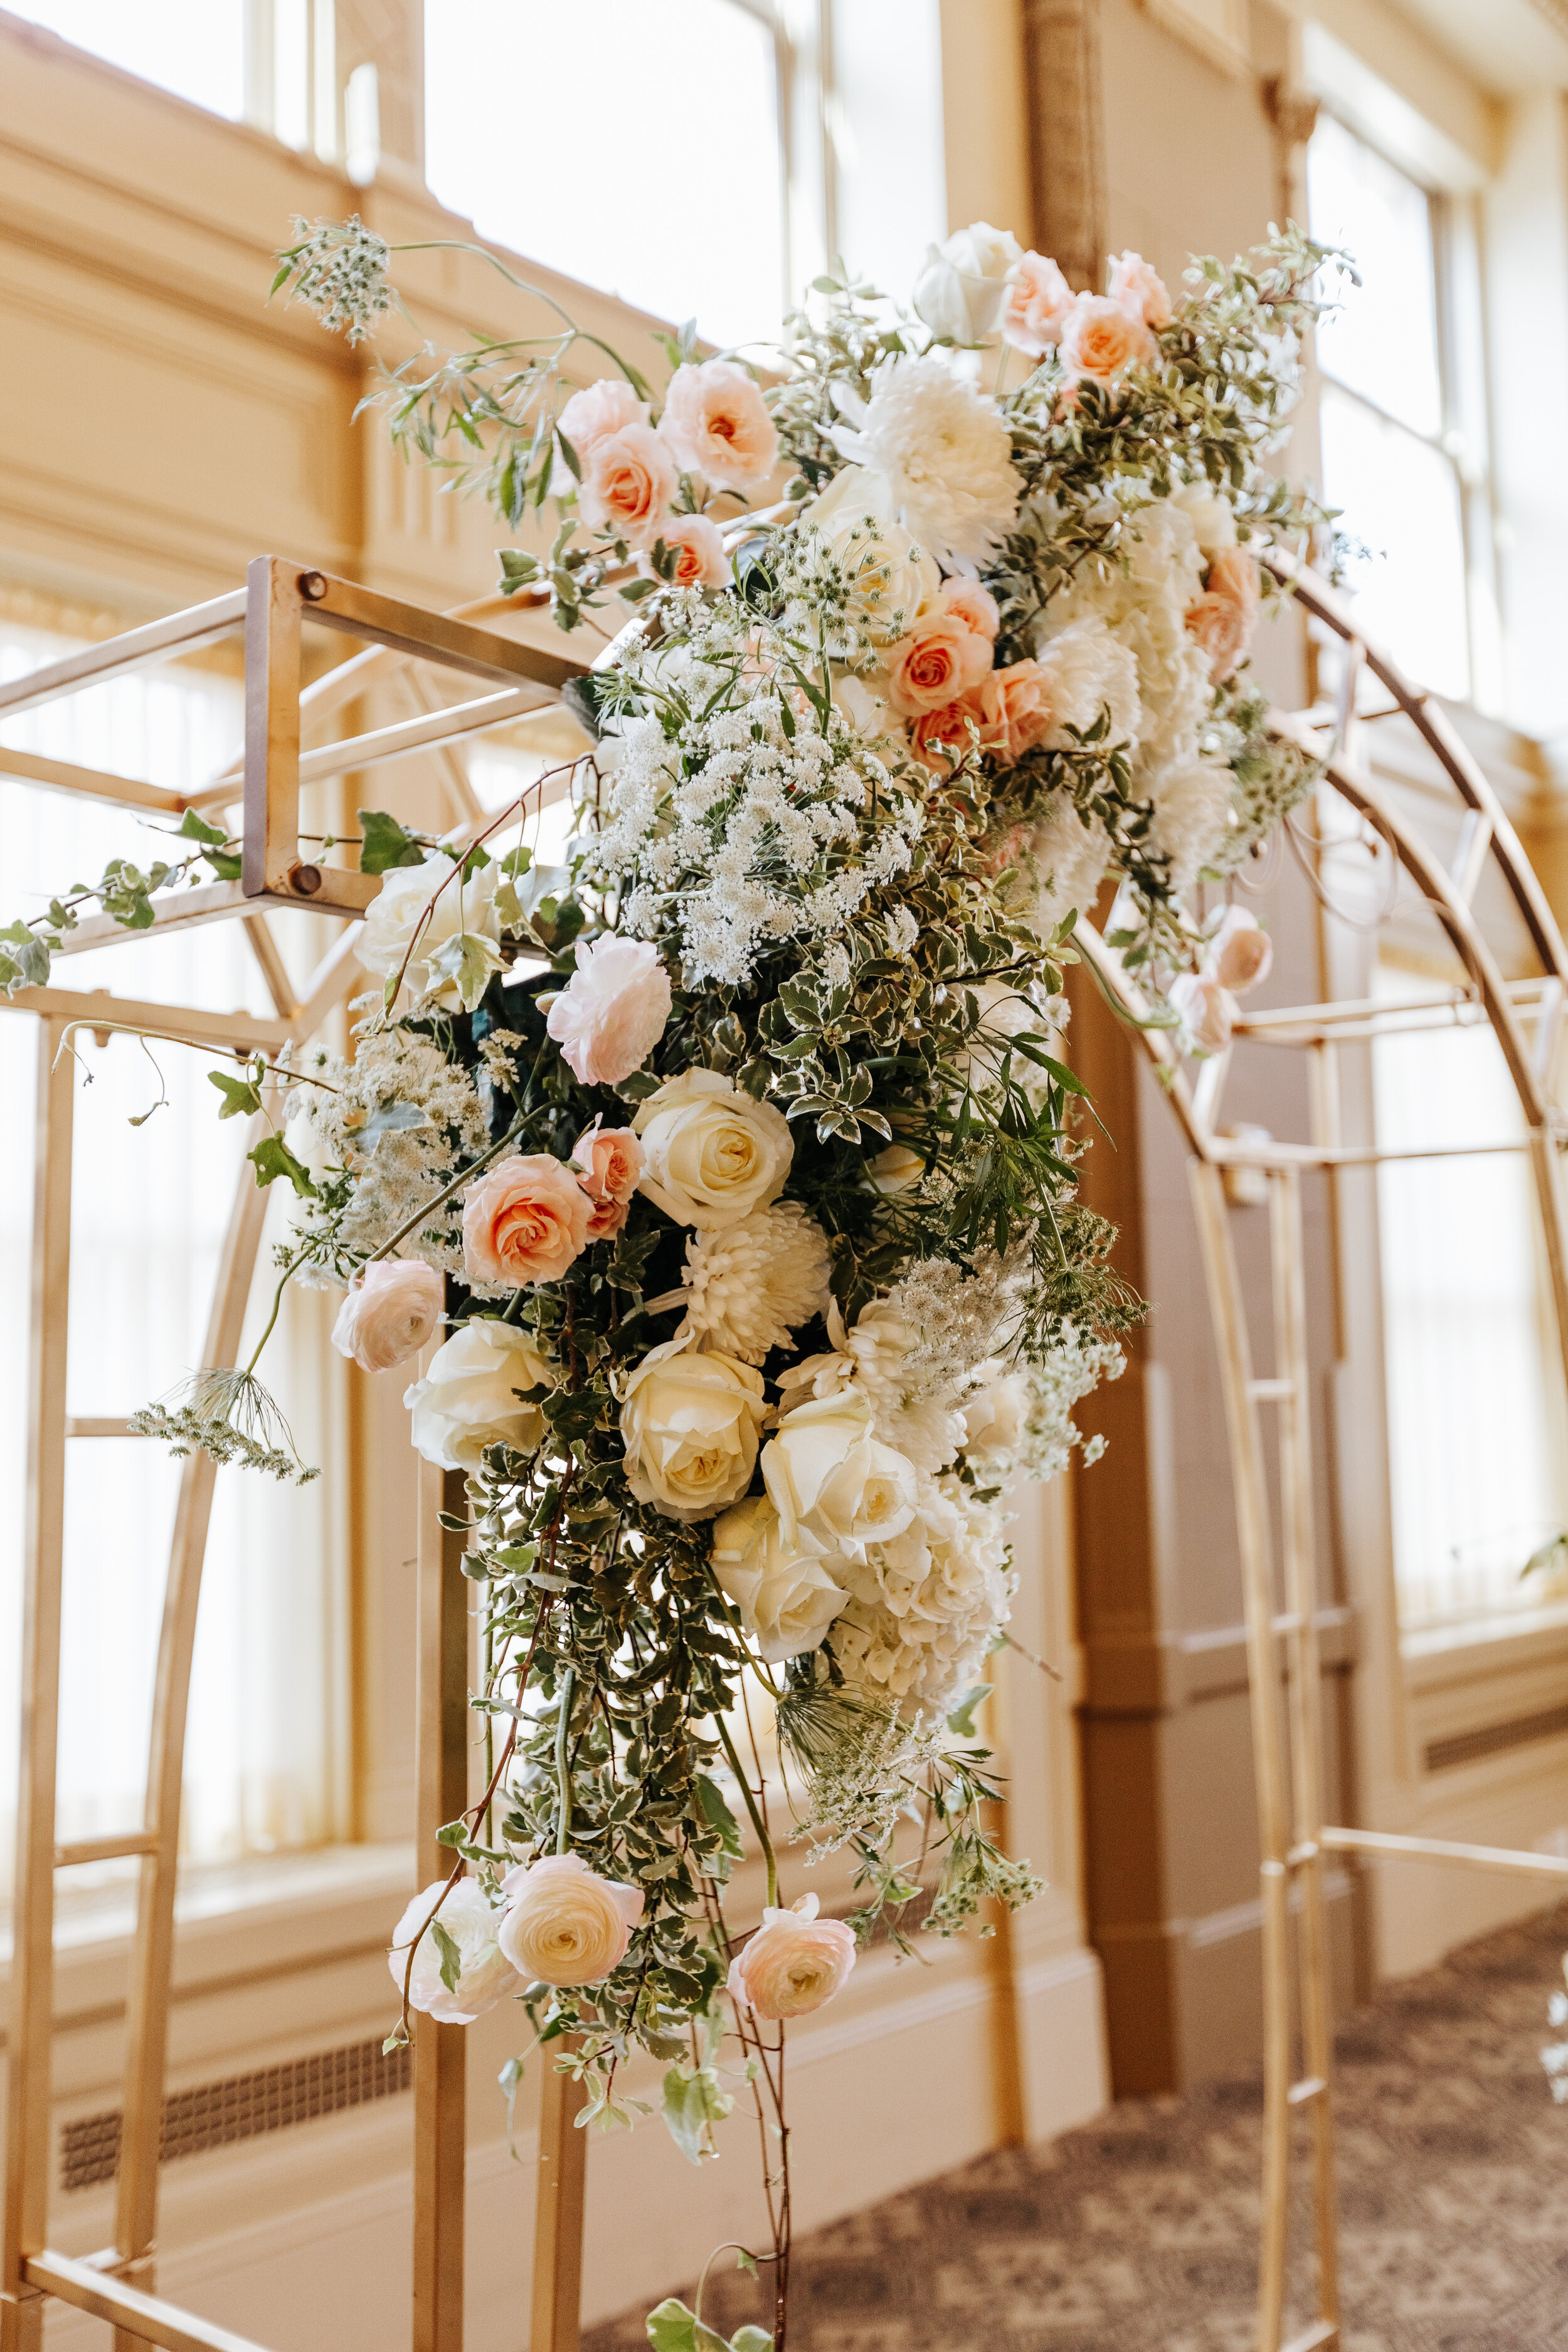 Cassie-Mrunal-Wedding-Quirk-Hotel-John-Marshall-Ballrooms-Richmond-Virginia-Photography-by-V-65.jpg